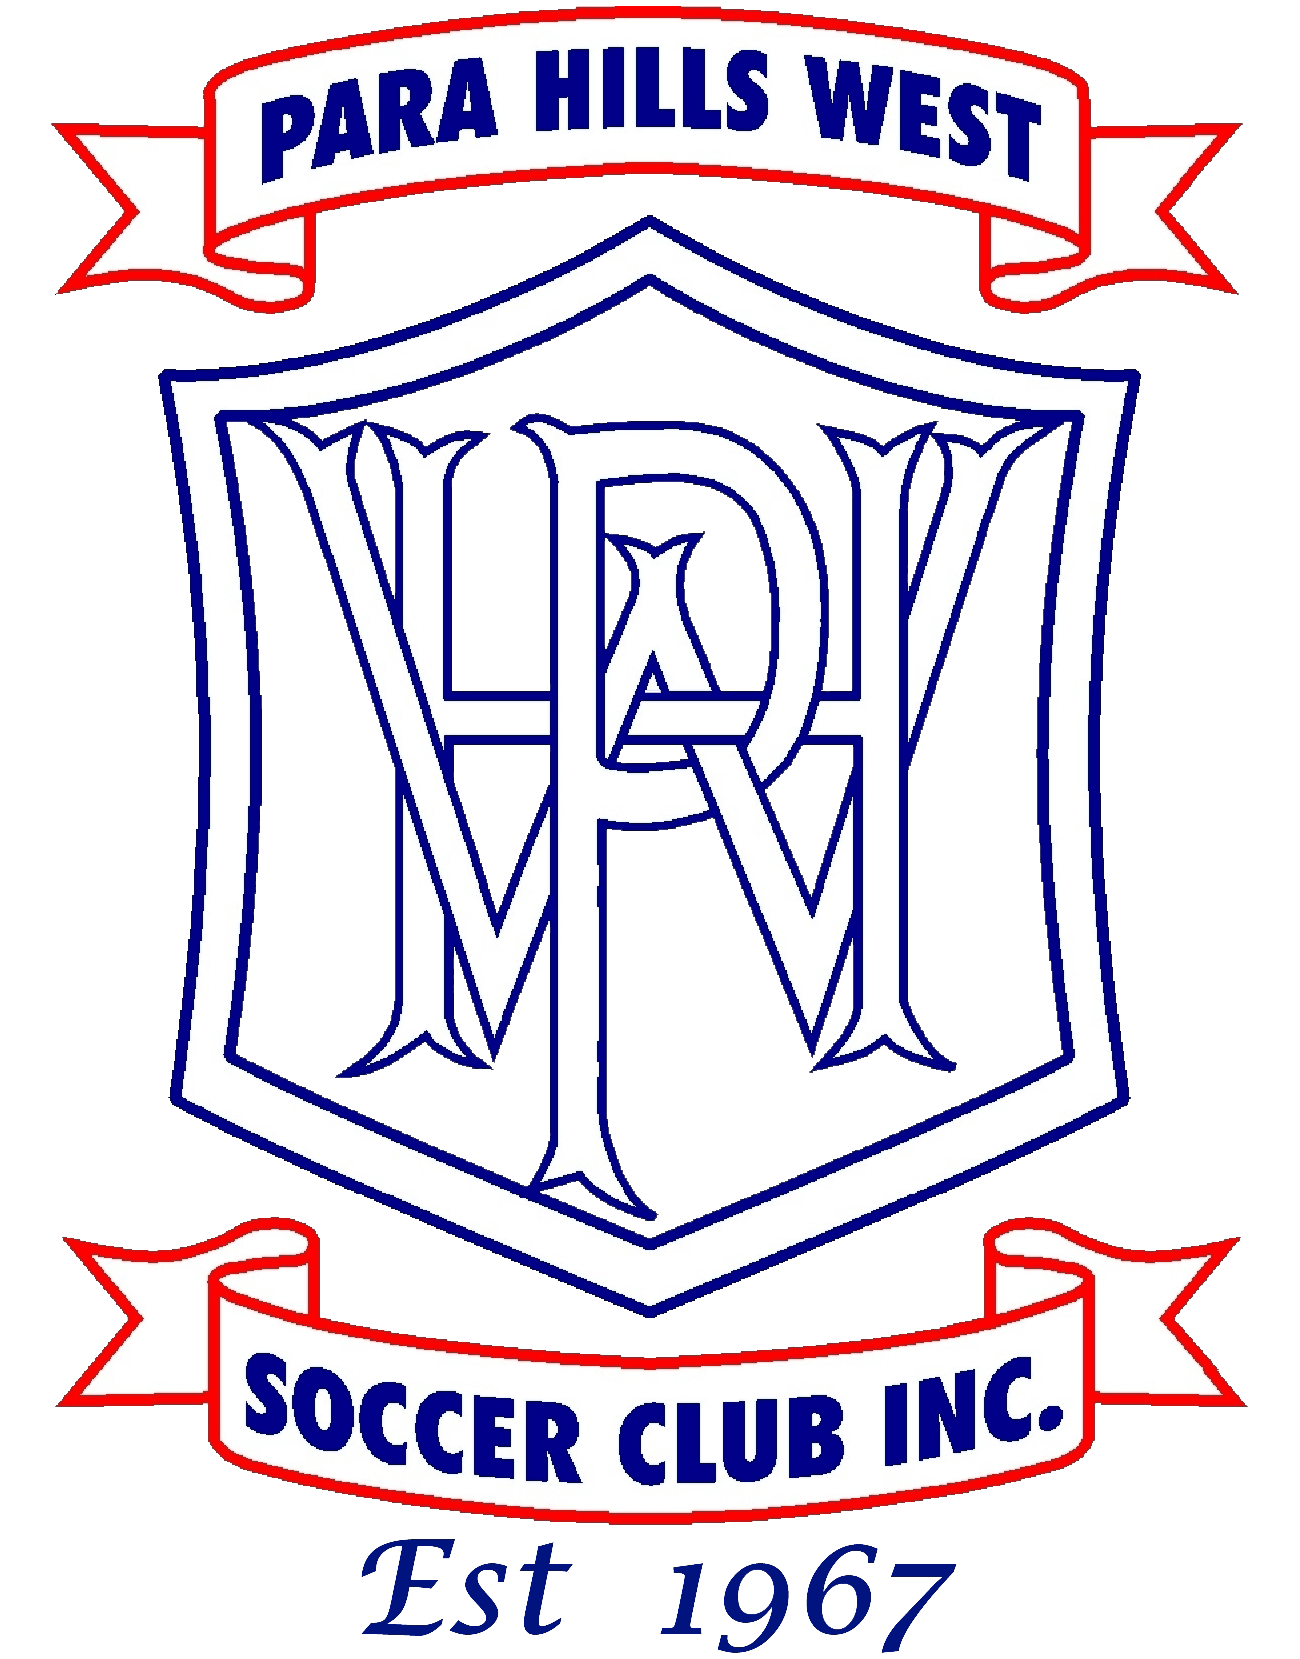 Para Hills West Soccer Club